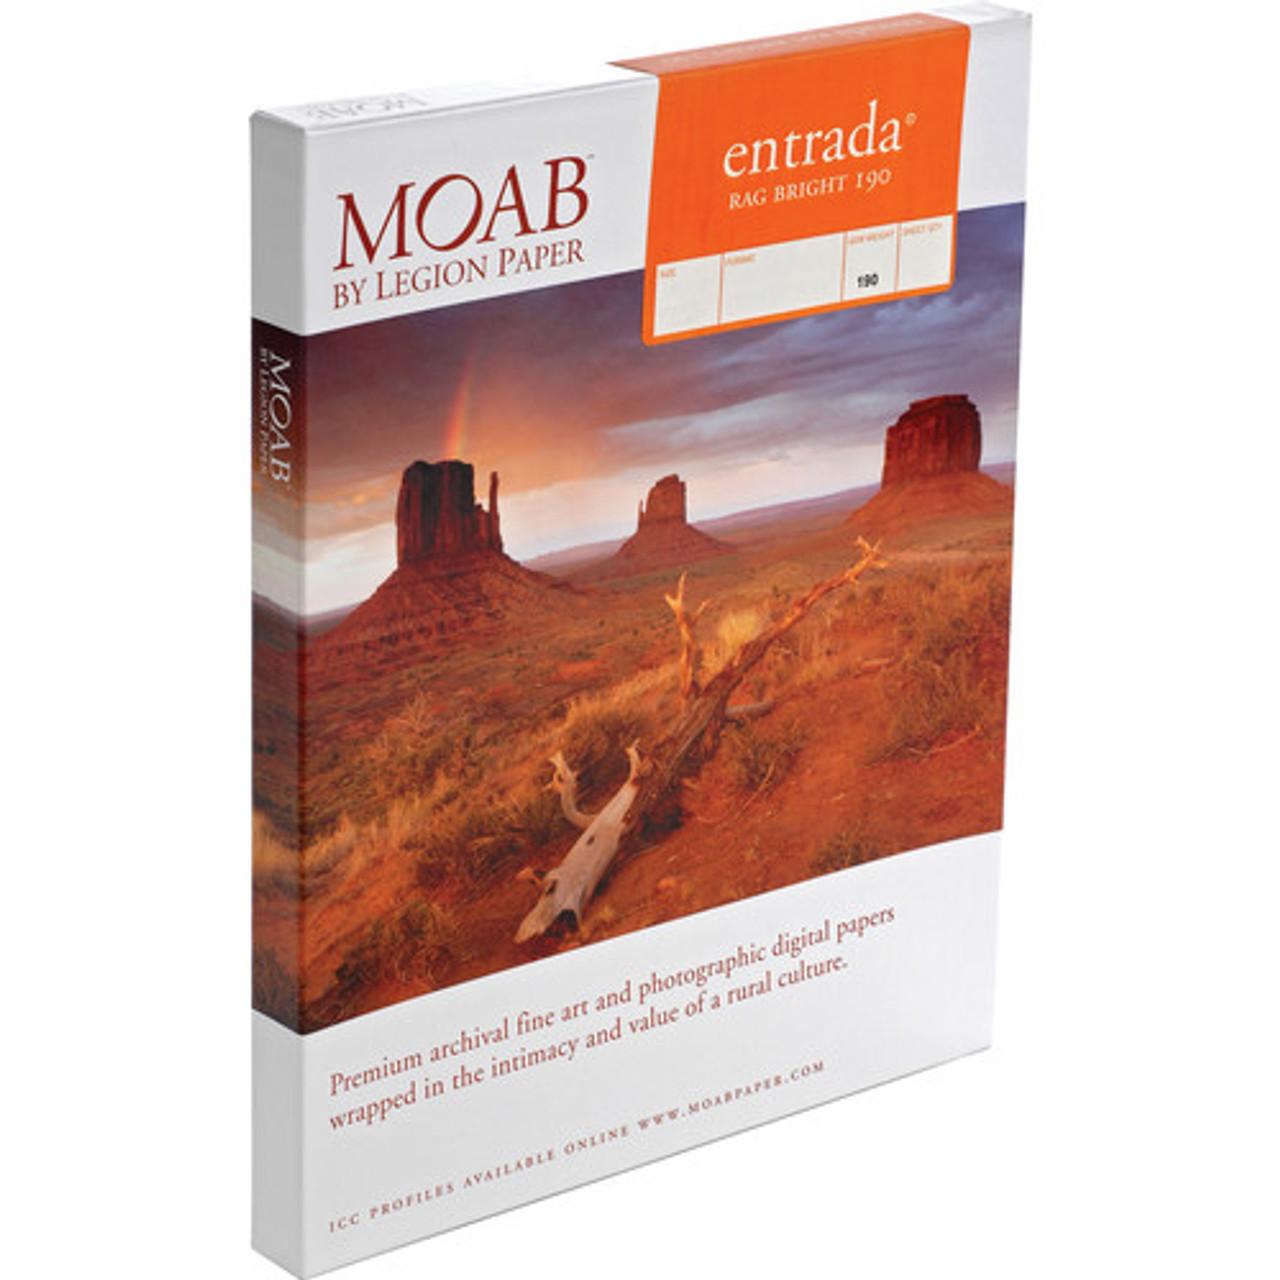 MOAB ENTRADA RAG BRIGHT 190 (25 SHEETS)